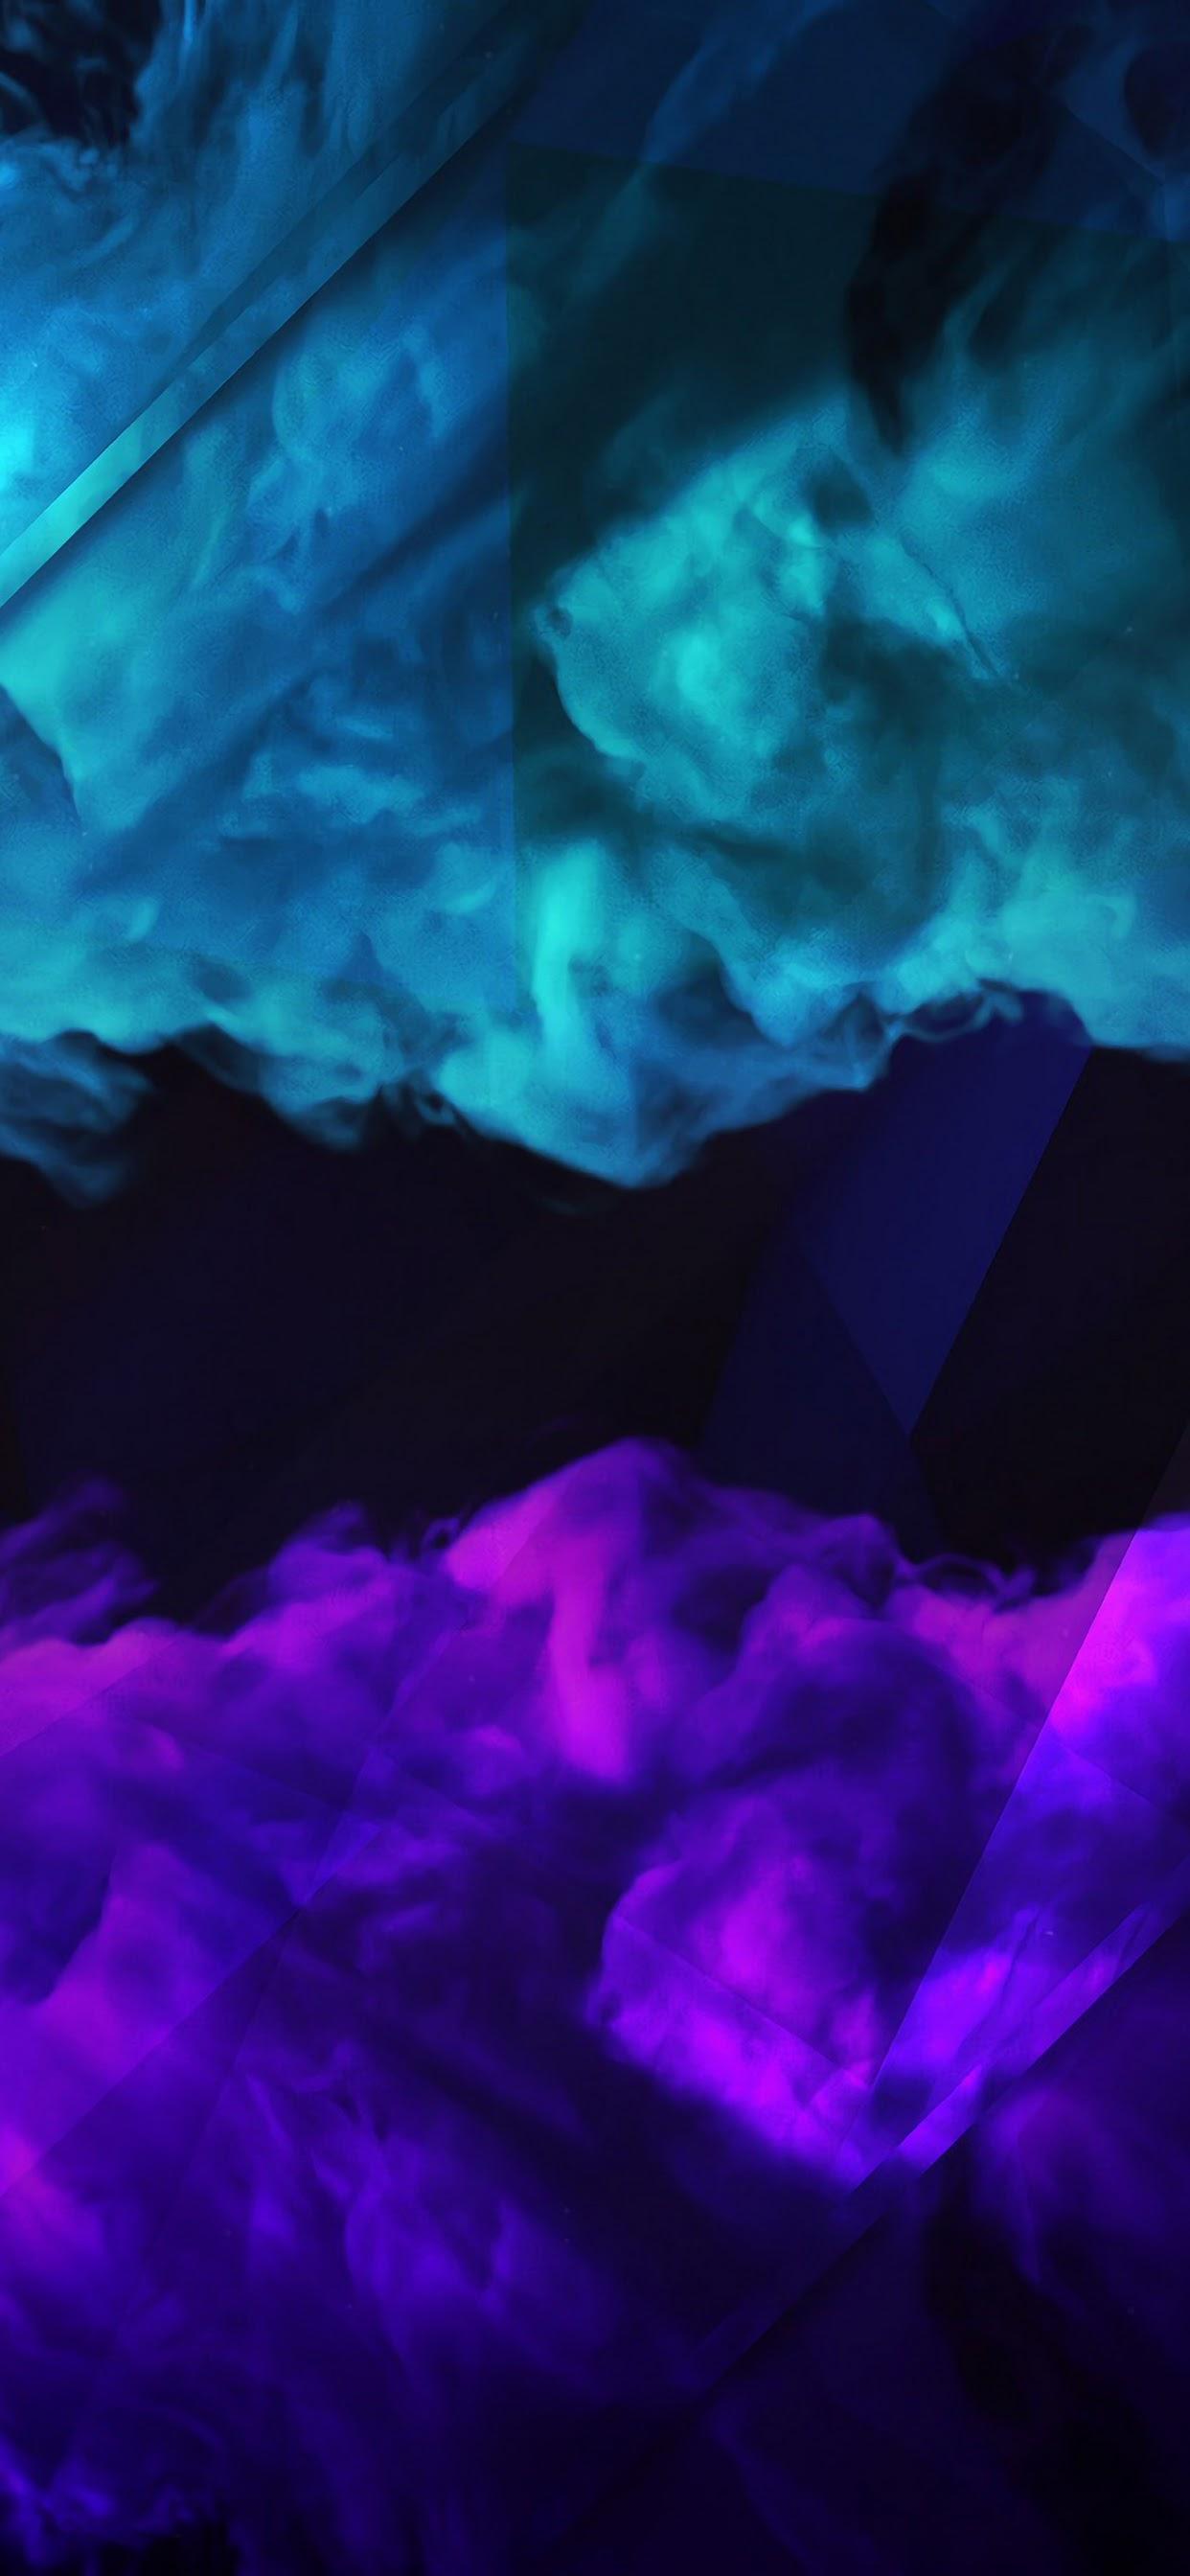 Dark Smoke Abstract 4k Wallpaper 37